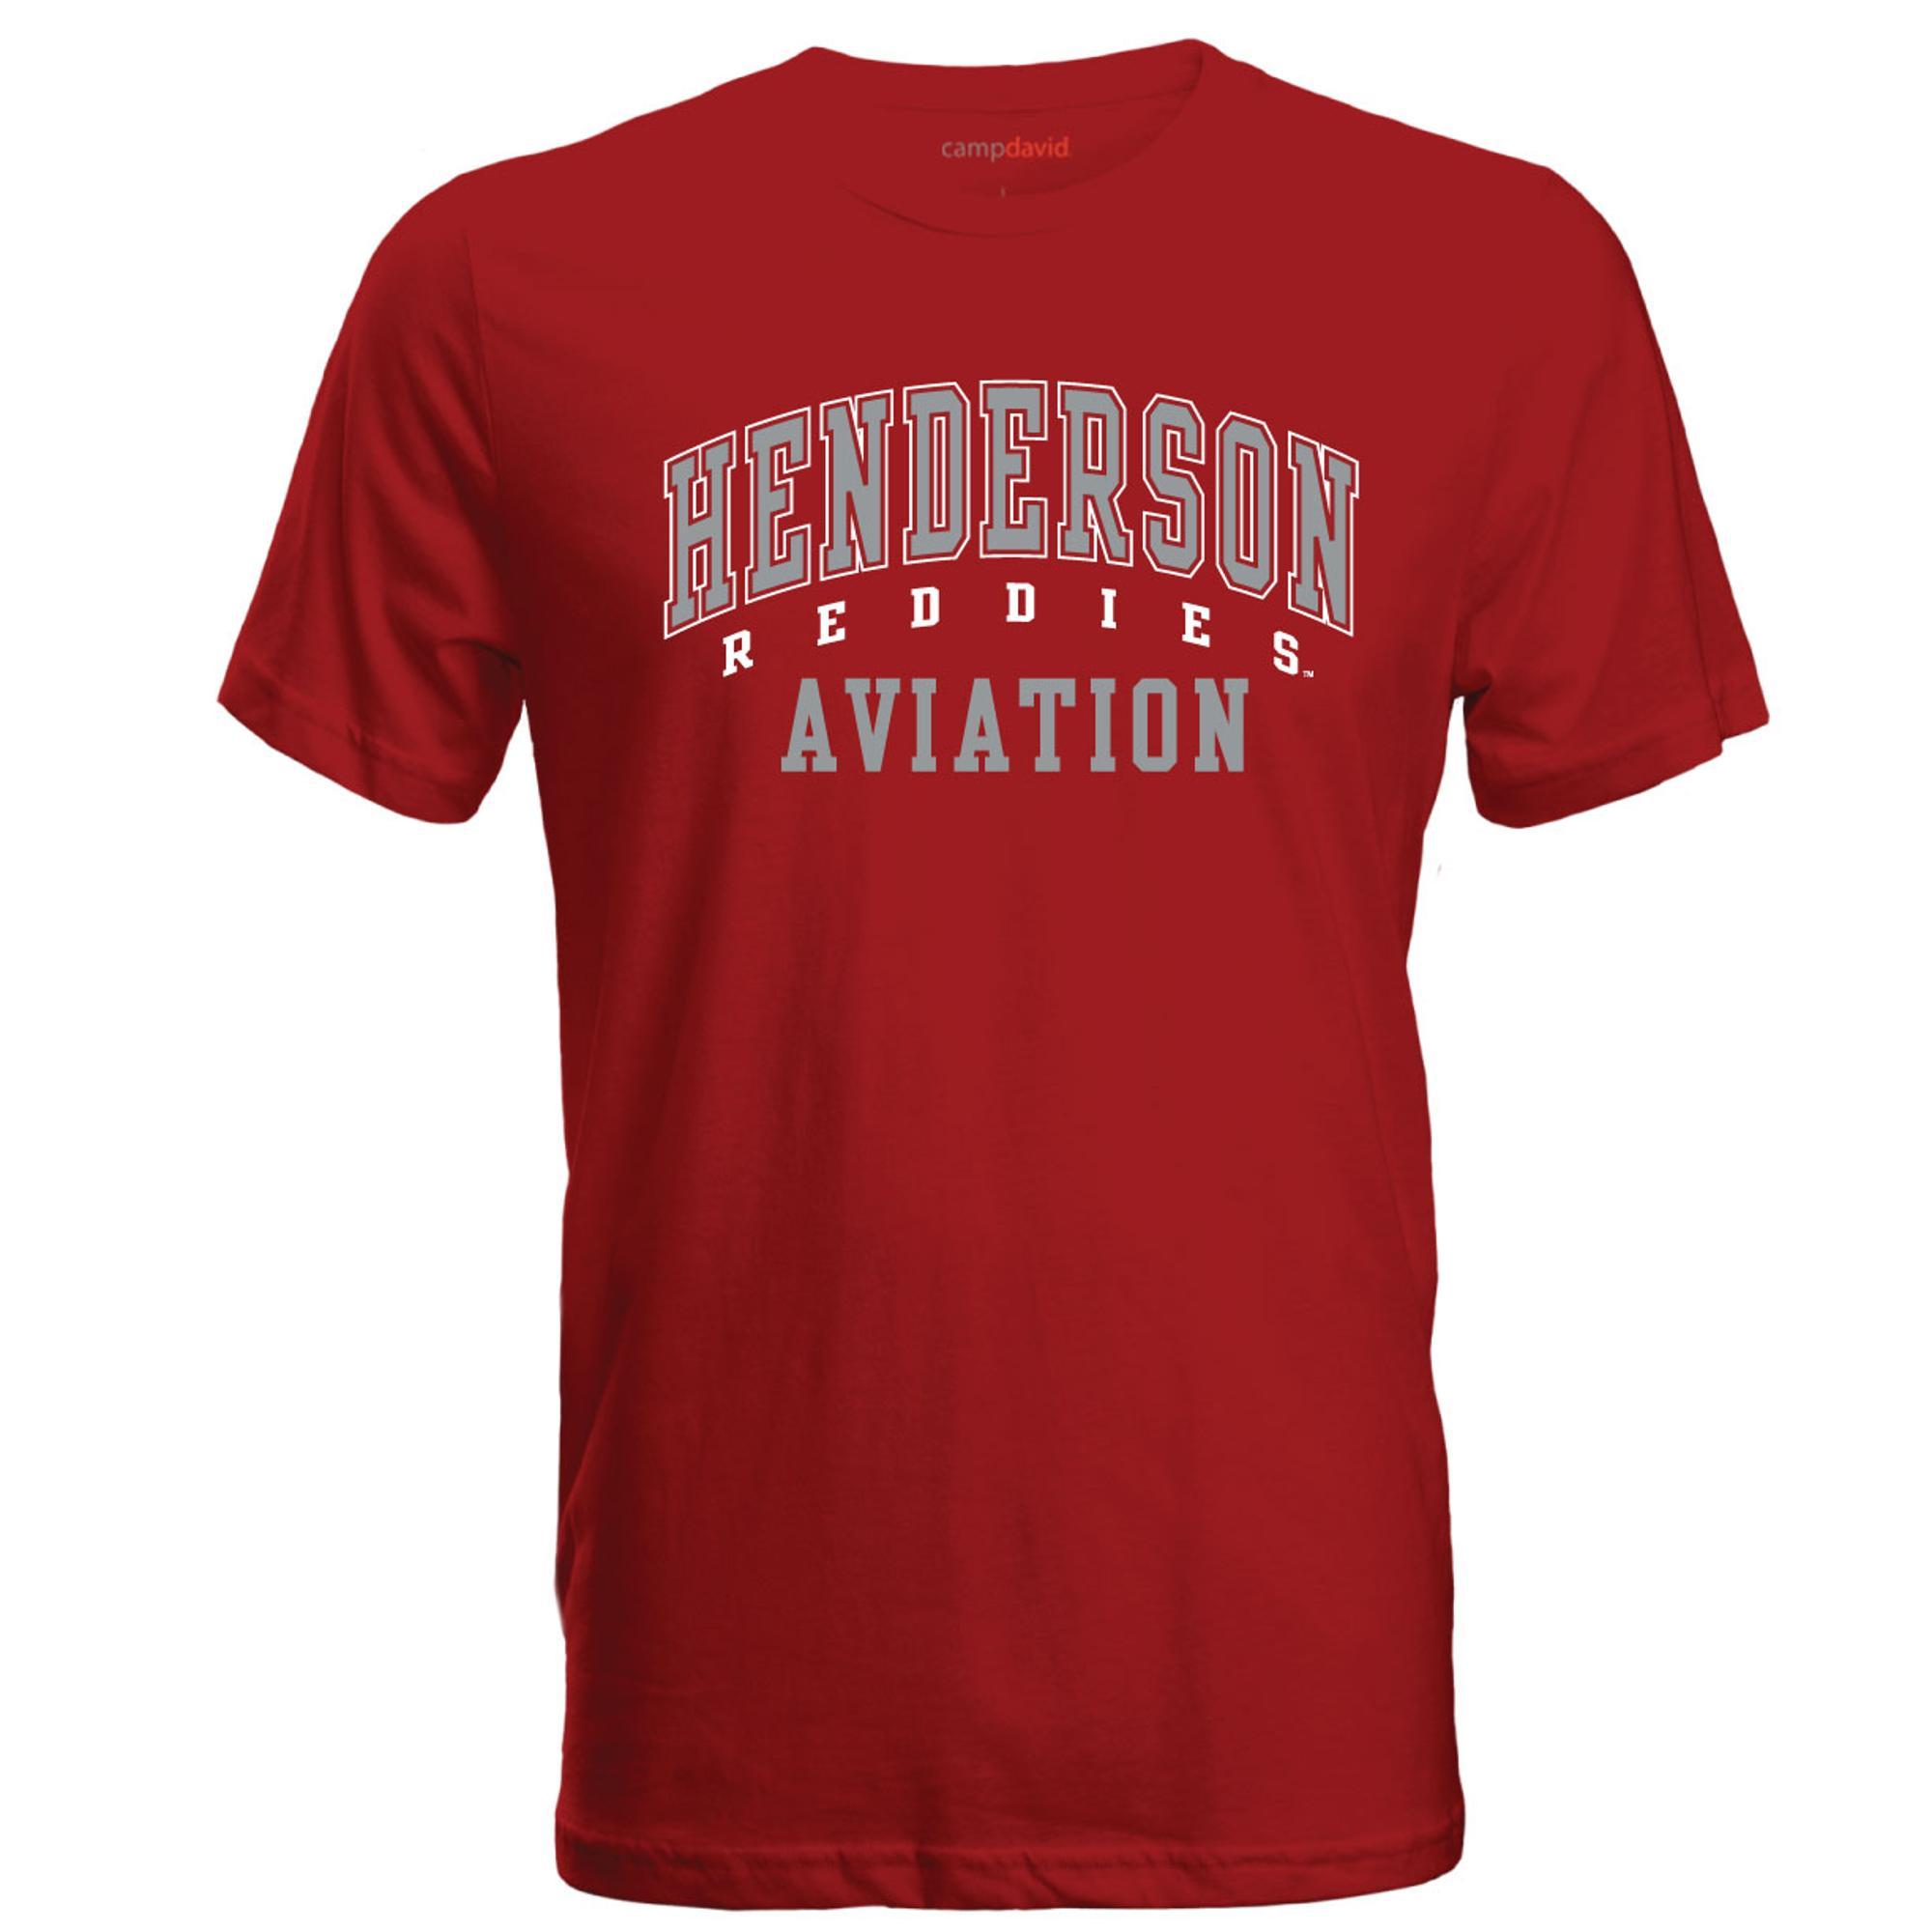 image of: Henderson Reddies Aviation Cruiser Tee